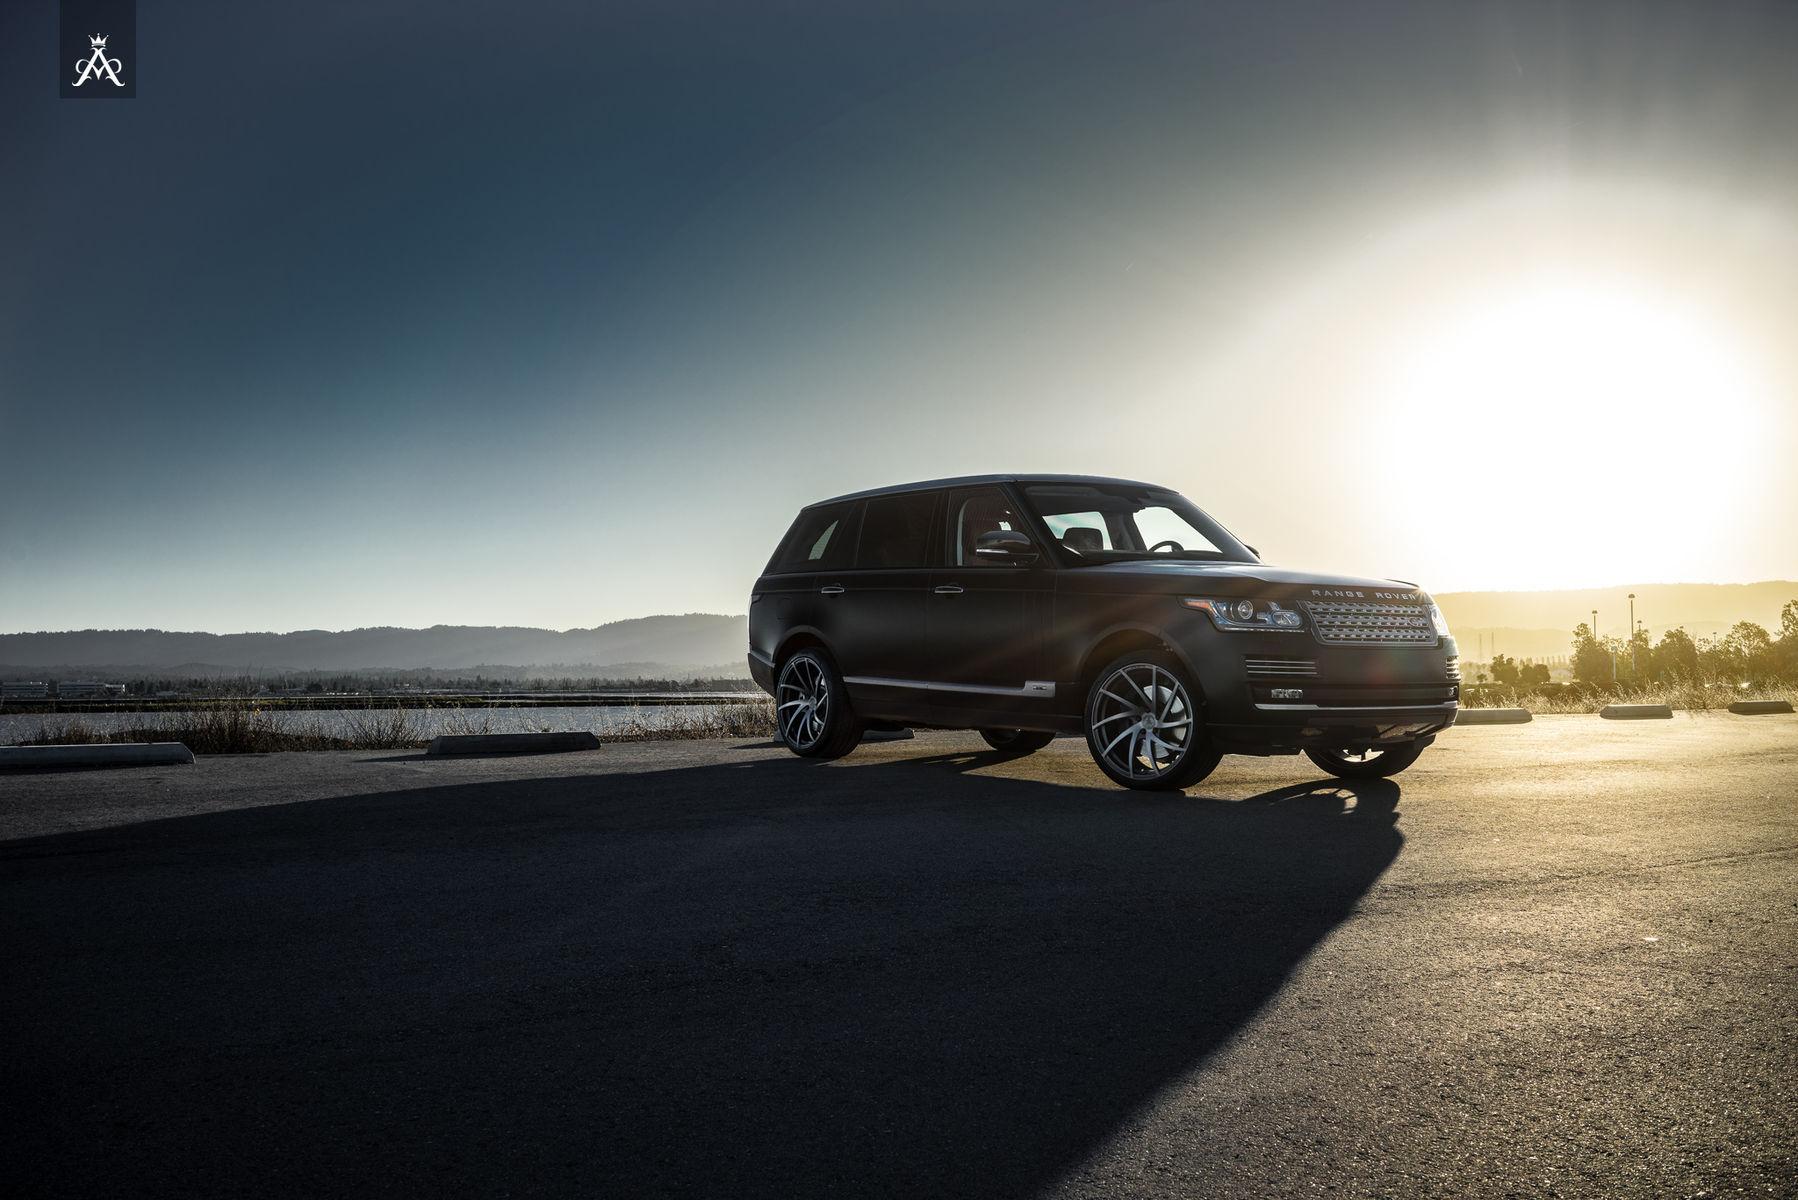 2014 Land Rover Range Rover | Range Rover Autobiography Twist 10 Monoblock